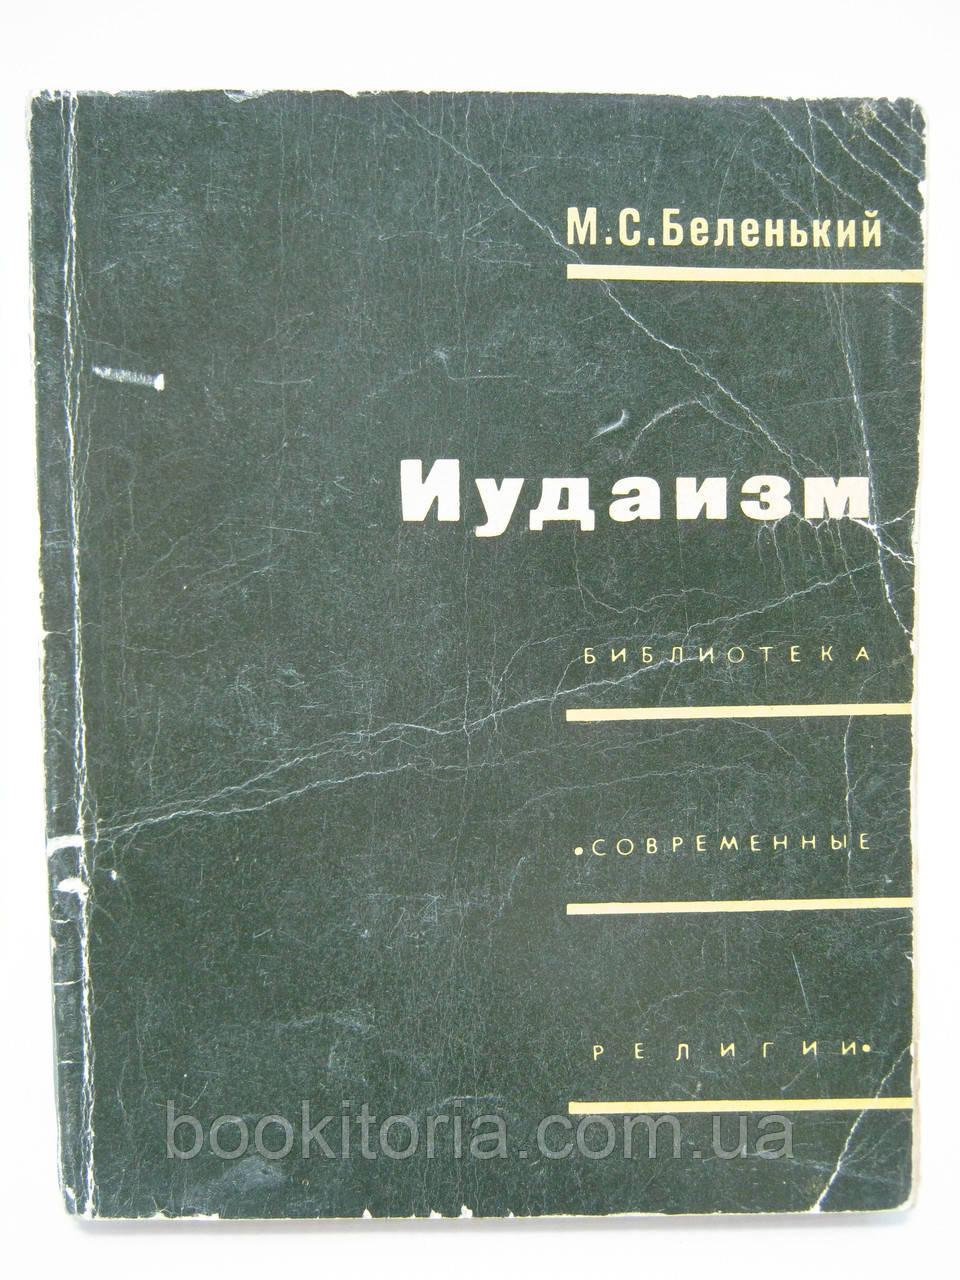 Беленький М.С. Иудаизм (б/у).